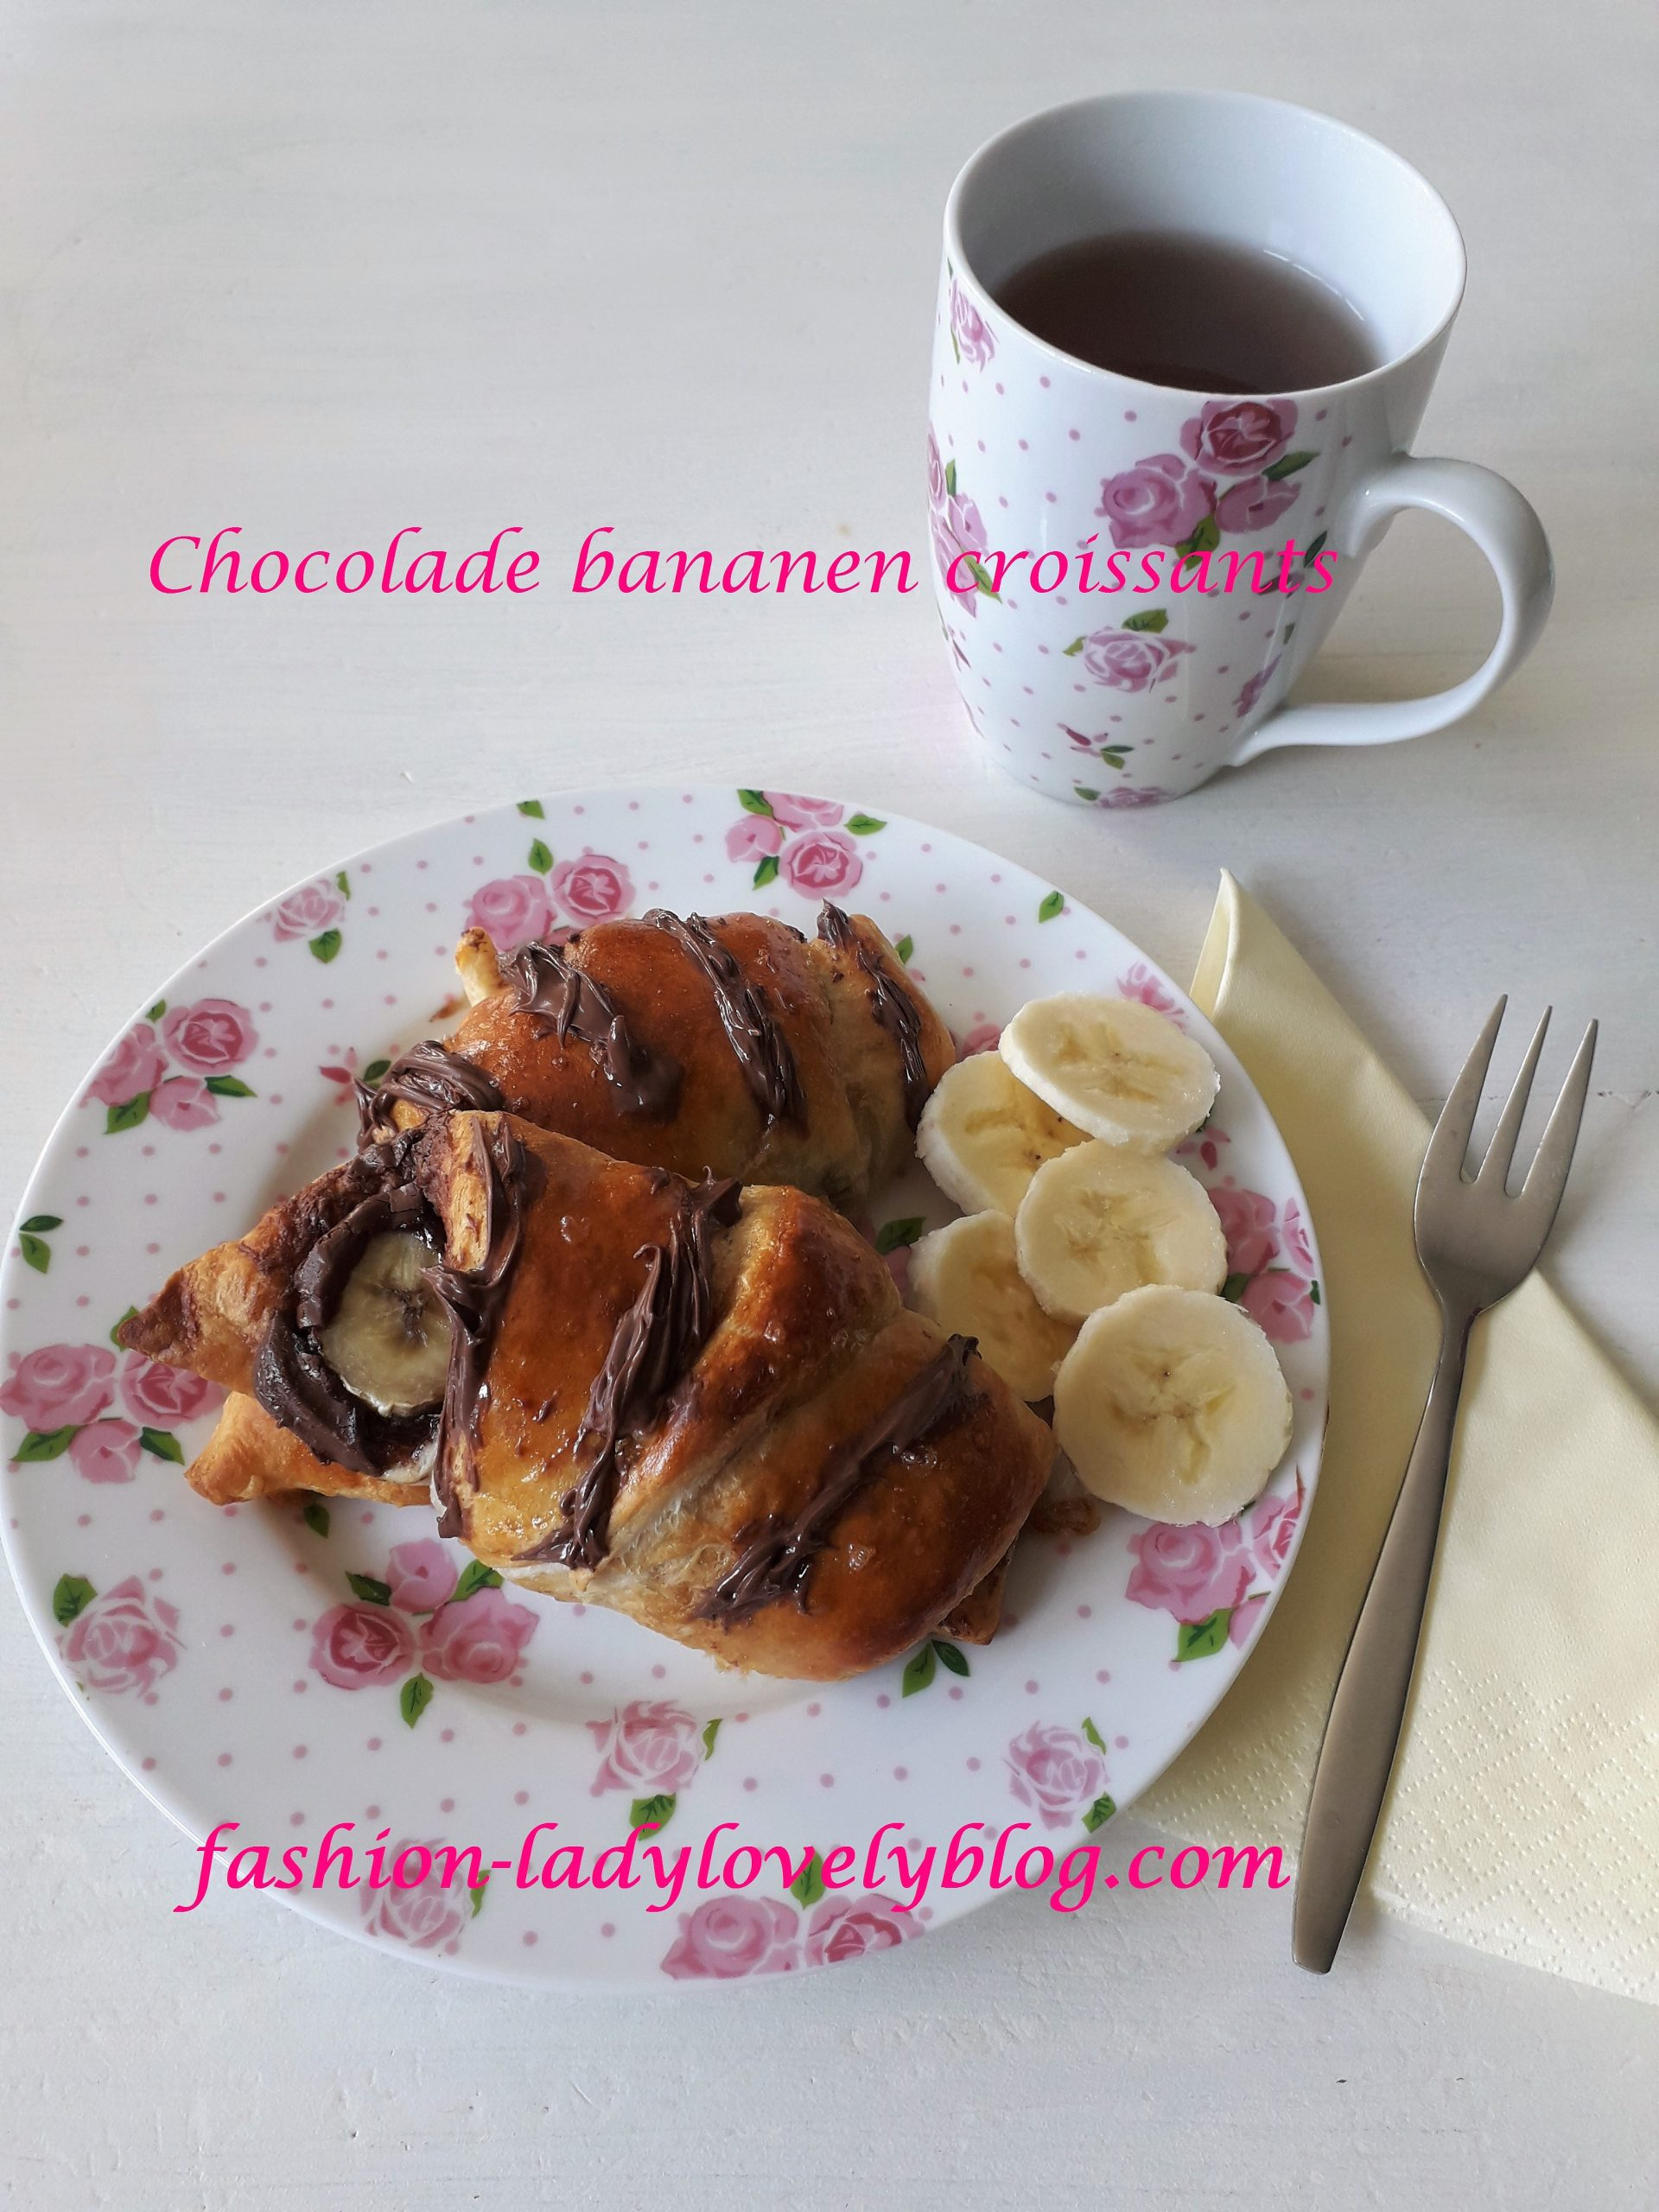 Chocolade bananen croissantjes